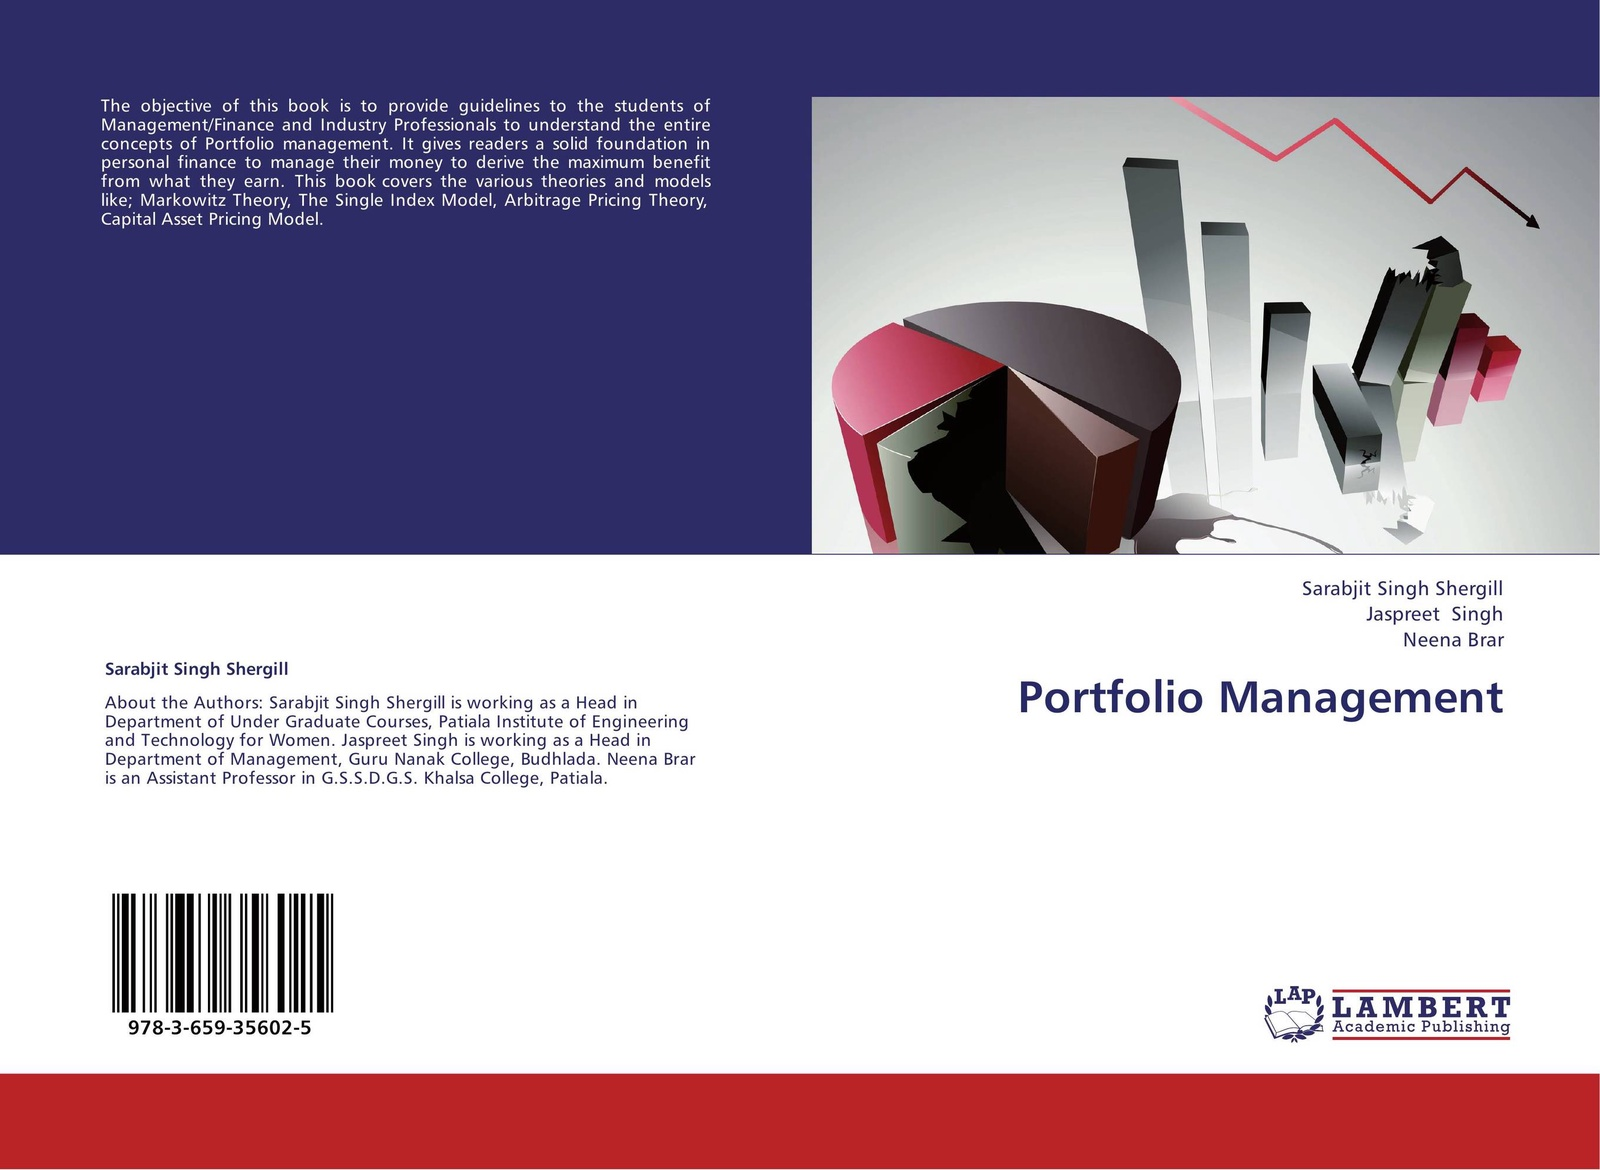 Фото - Sarabjit Singh Shergill,Jaspreet Singh and Neena Brar Portfolio Management ralph vince the leverage space trading model reconciling portfolio management strategies and economic theory